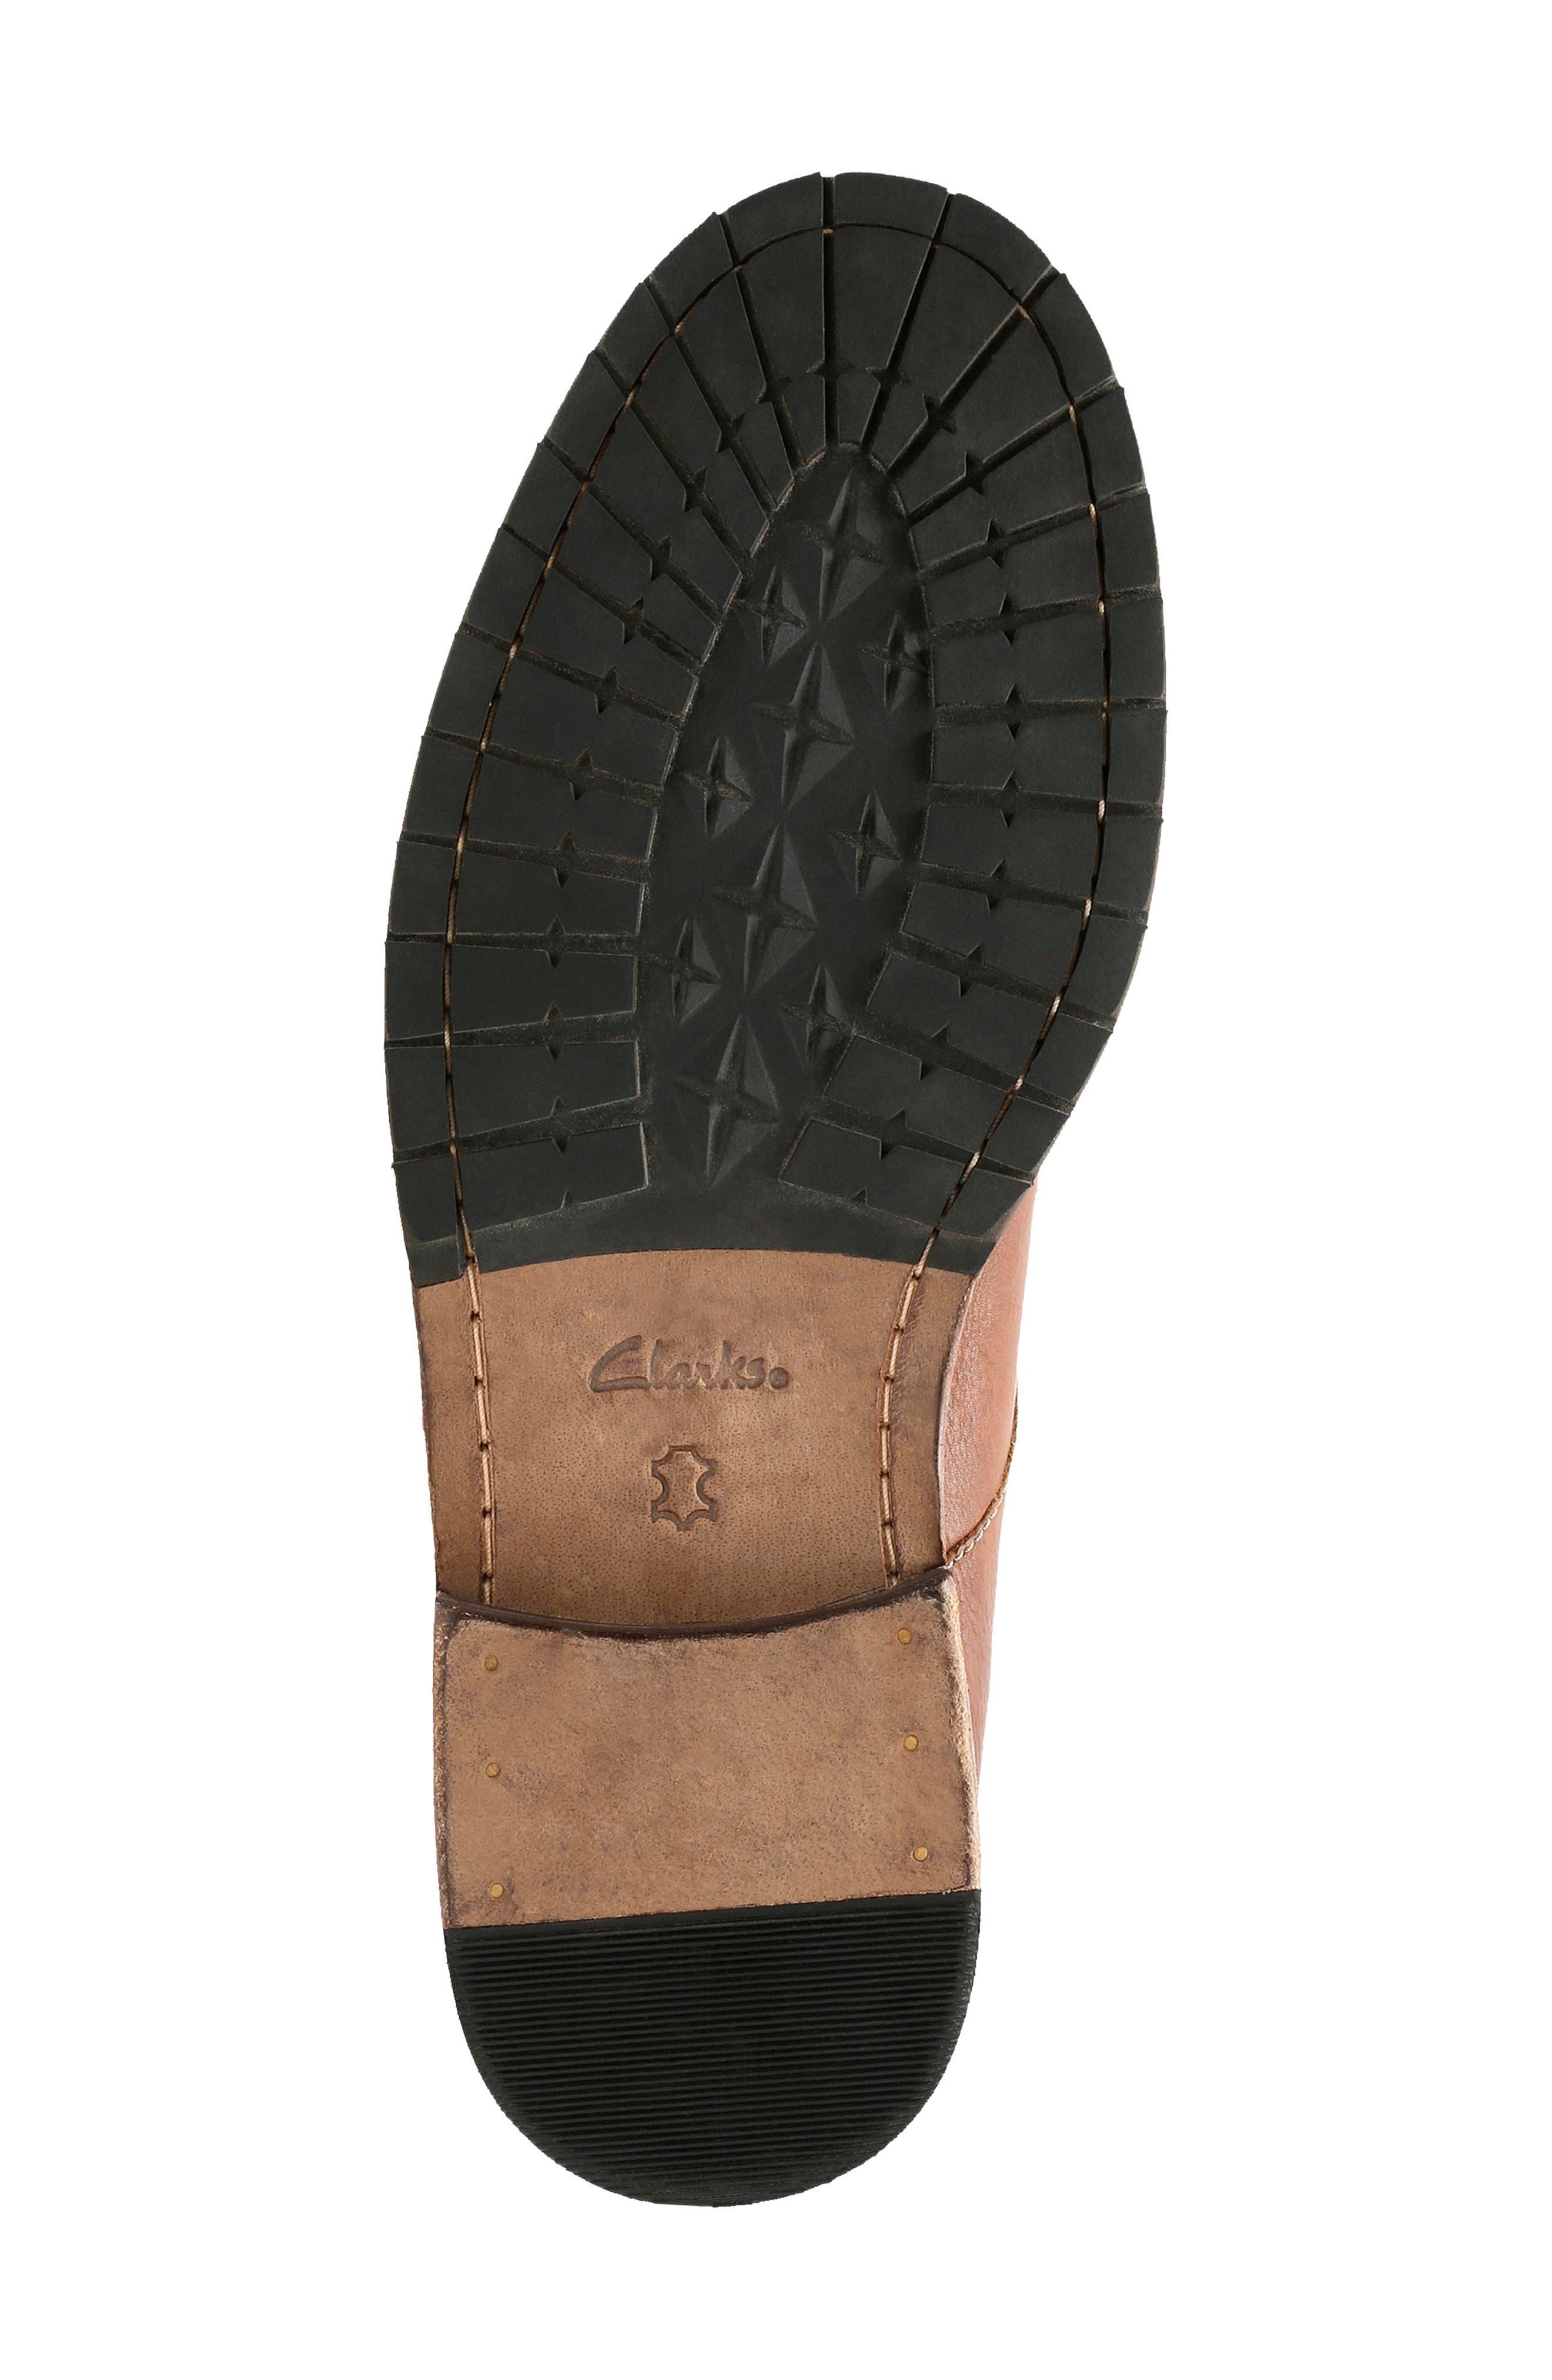 Clarkdale Bud Plain Toe Boot,                             Alternate thumbnail 4, color,                             DARK TAN LEATHER